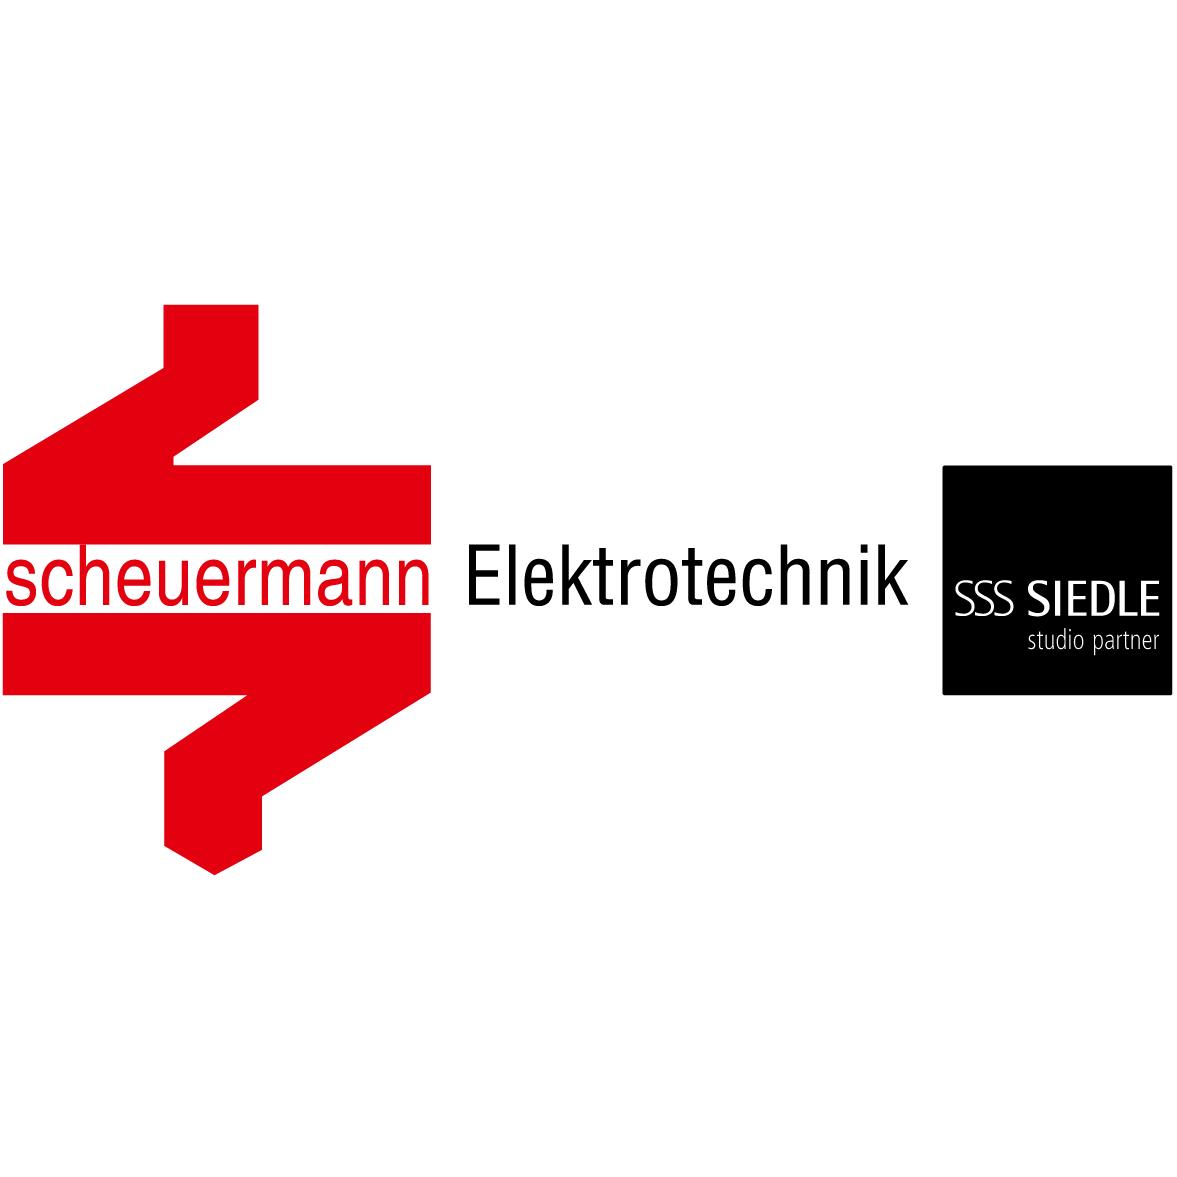 Bild zu Scheuermann Elektrotechnik in Heilbronn am Neckar